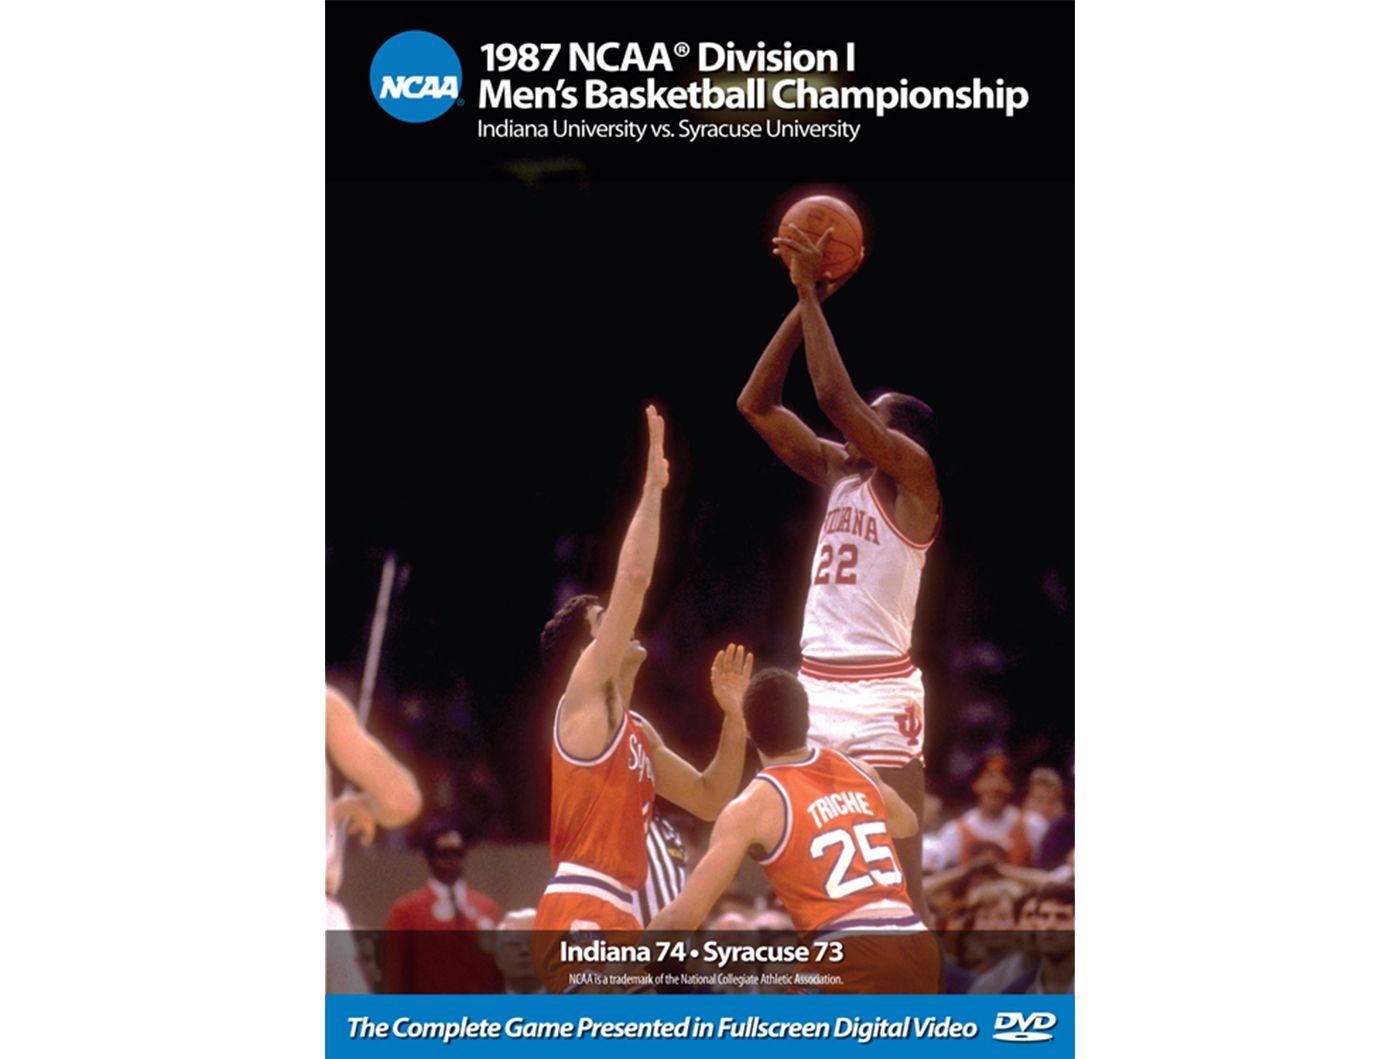 1987 NCAA Men's Basketball Championship Game - Indiana vs. Syracuse DVD